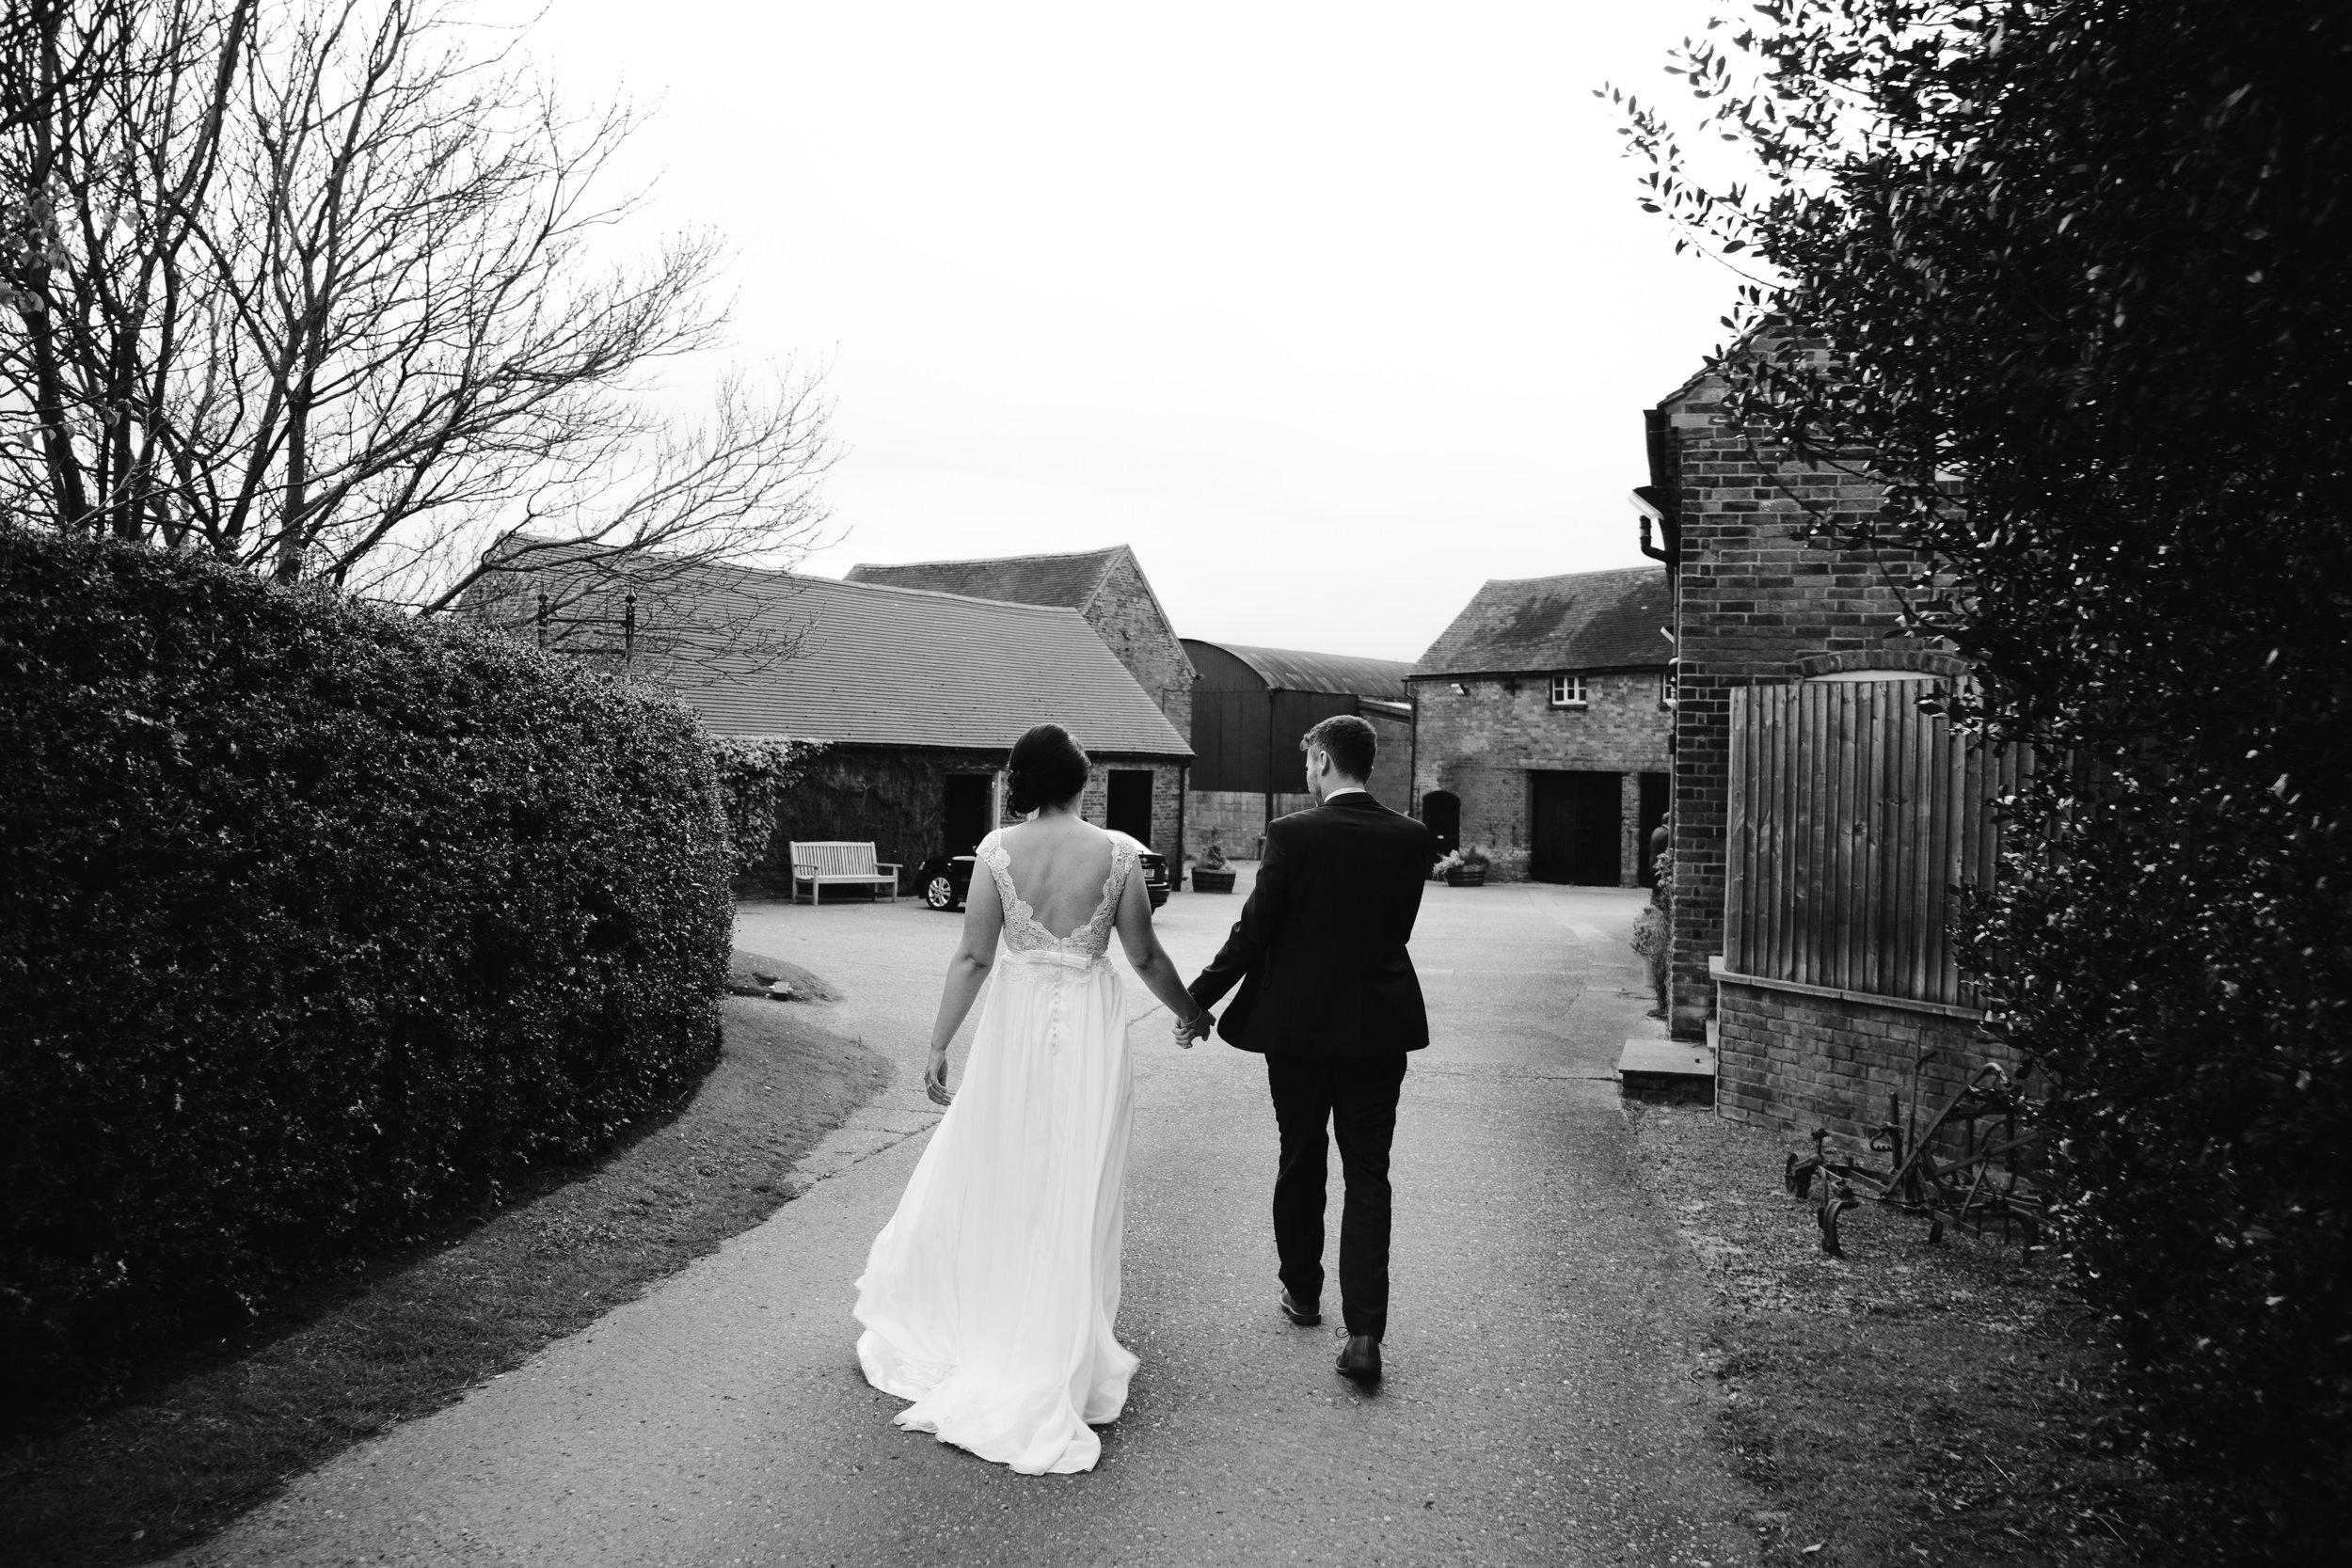 Packington Moor, Barn wedding, Packington Moor Barn, rustic wedding, Staffordshire wedding, Staffordshire wedding photographer-221.jpg